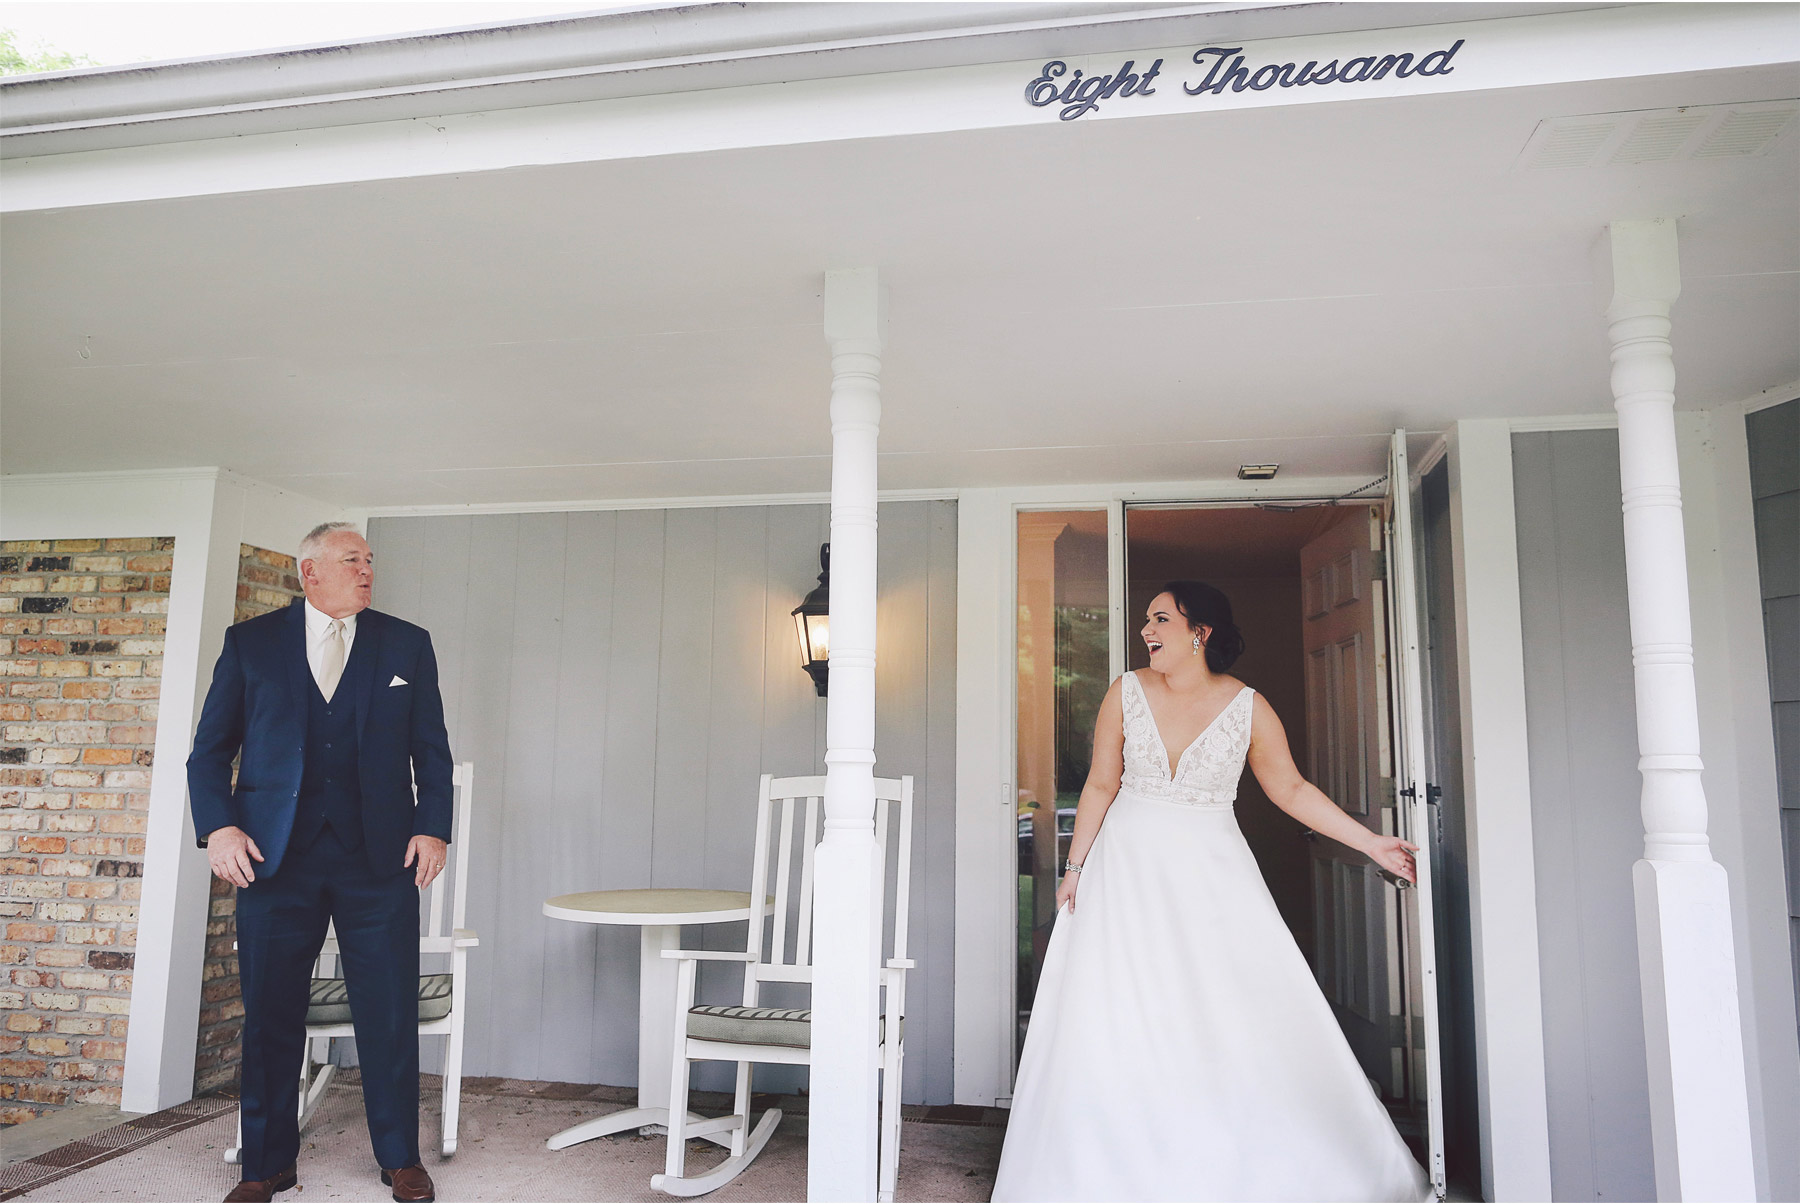 04-Vick-Photography-Wedding-Minneapolis-Minnesota-Bride-Dress-Father-Erin-and-David.jpg